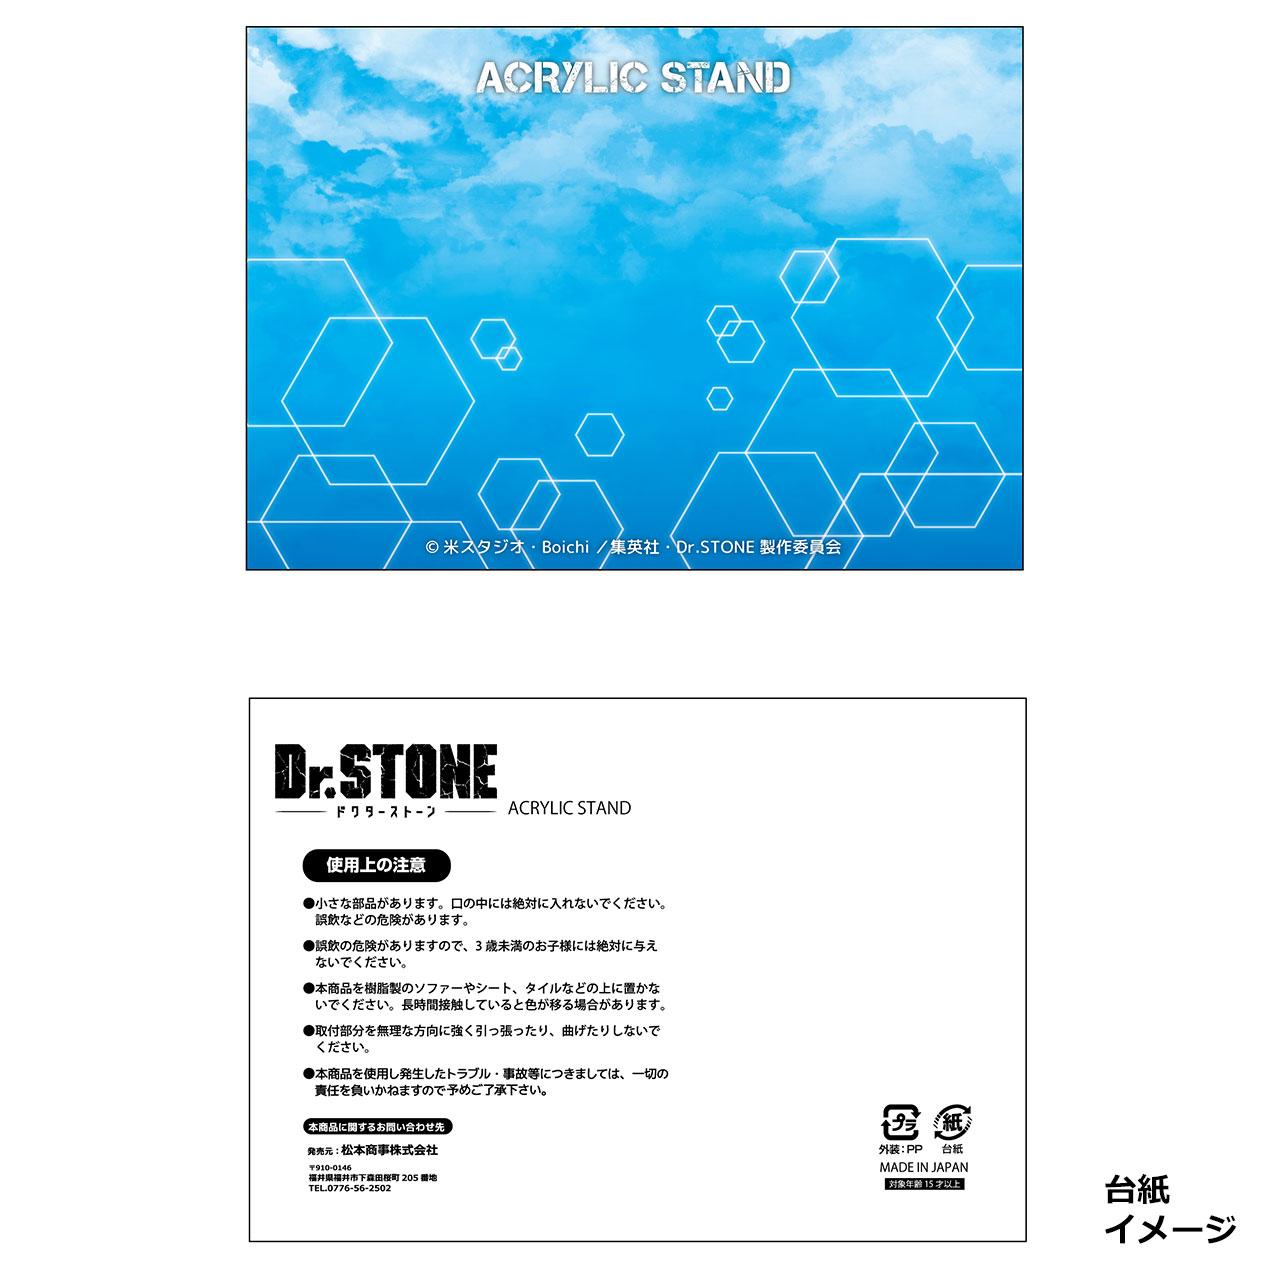 Dr.STONE BIGアクリルスタンド